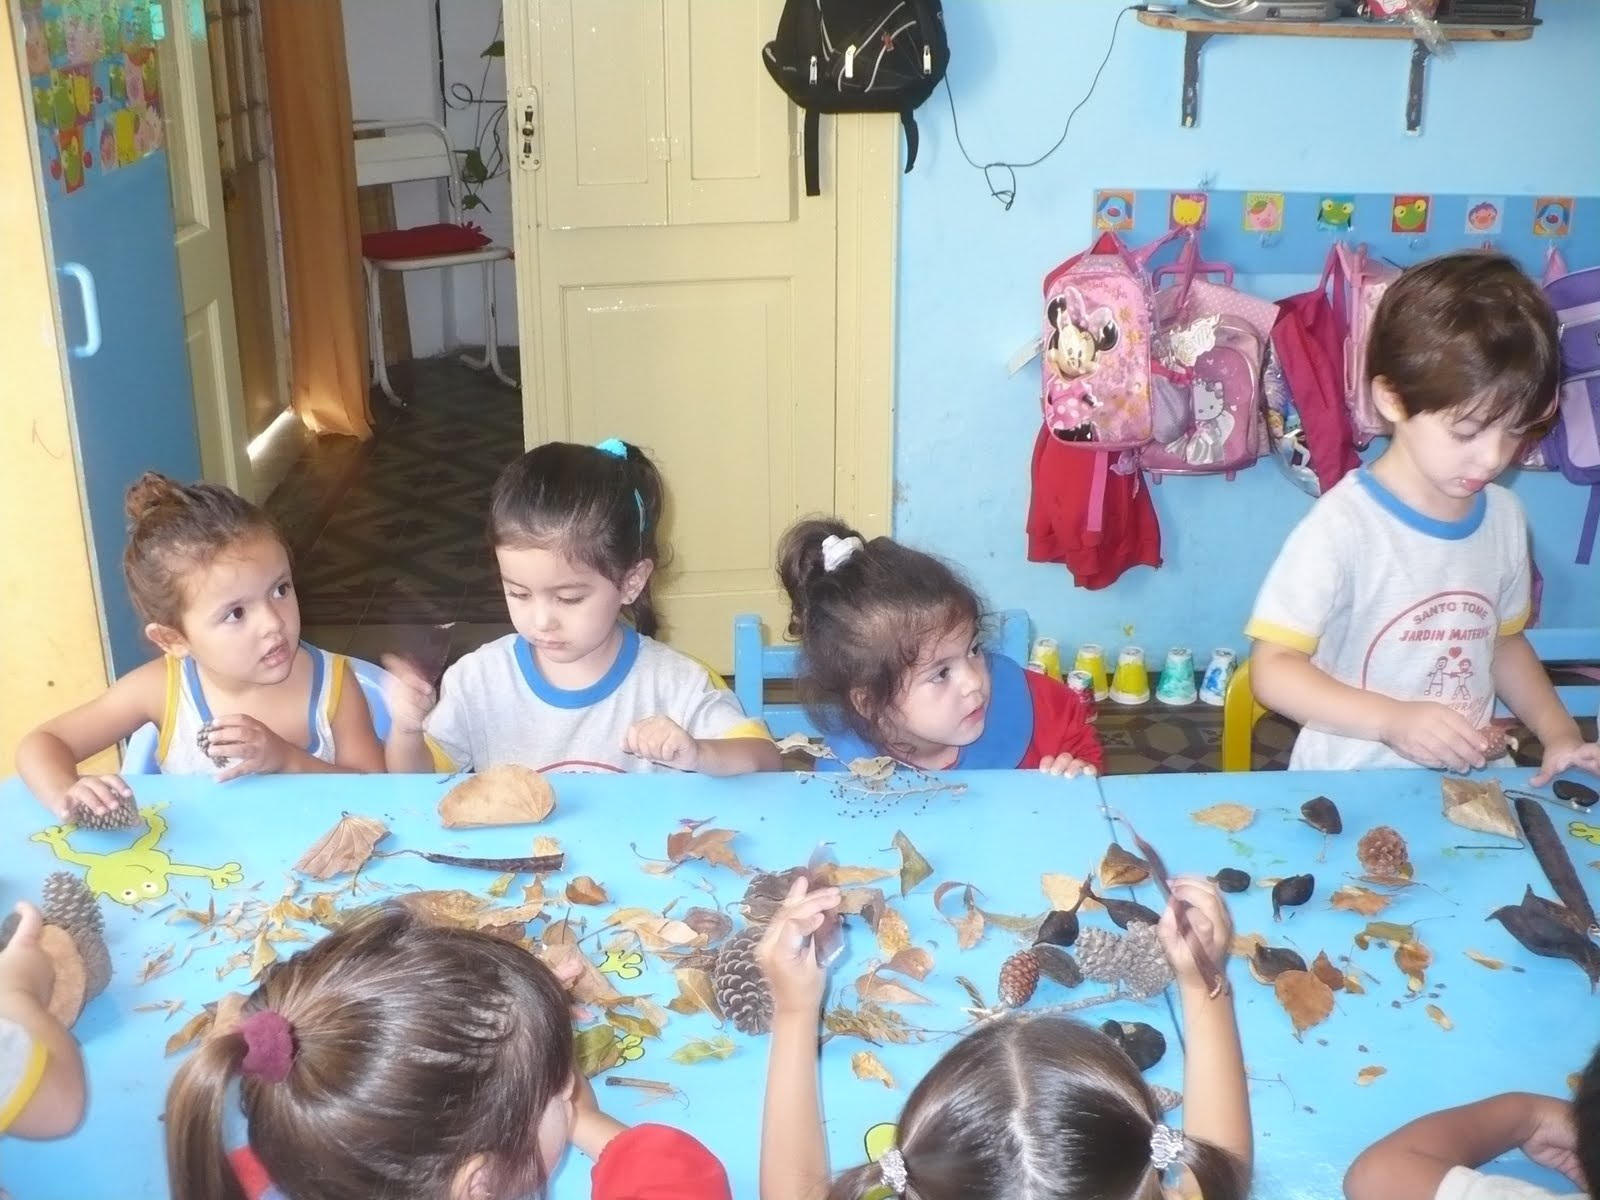 Jard n maternal las aventuras de cristian y diego for Adaptacion jardin maternal